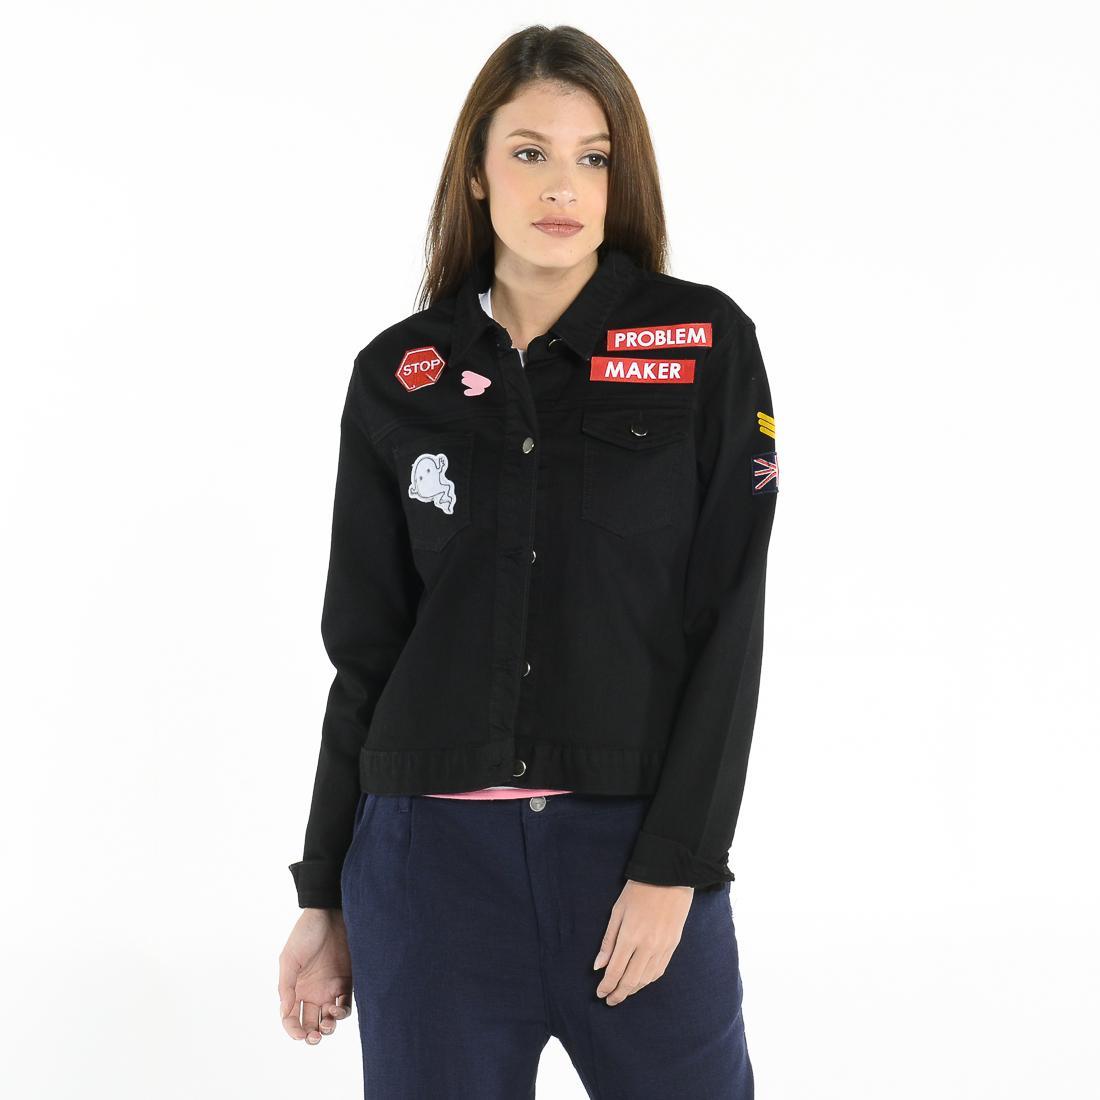 Denim Jackets for Women for sale - Womens Denim Jackets brands ...